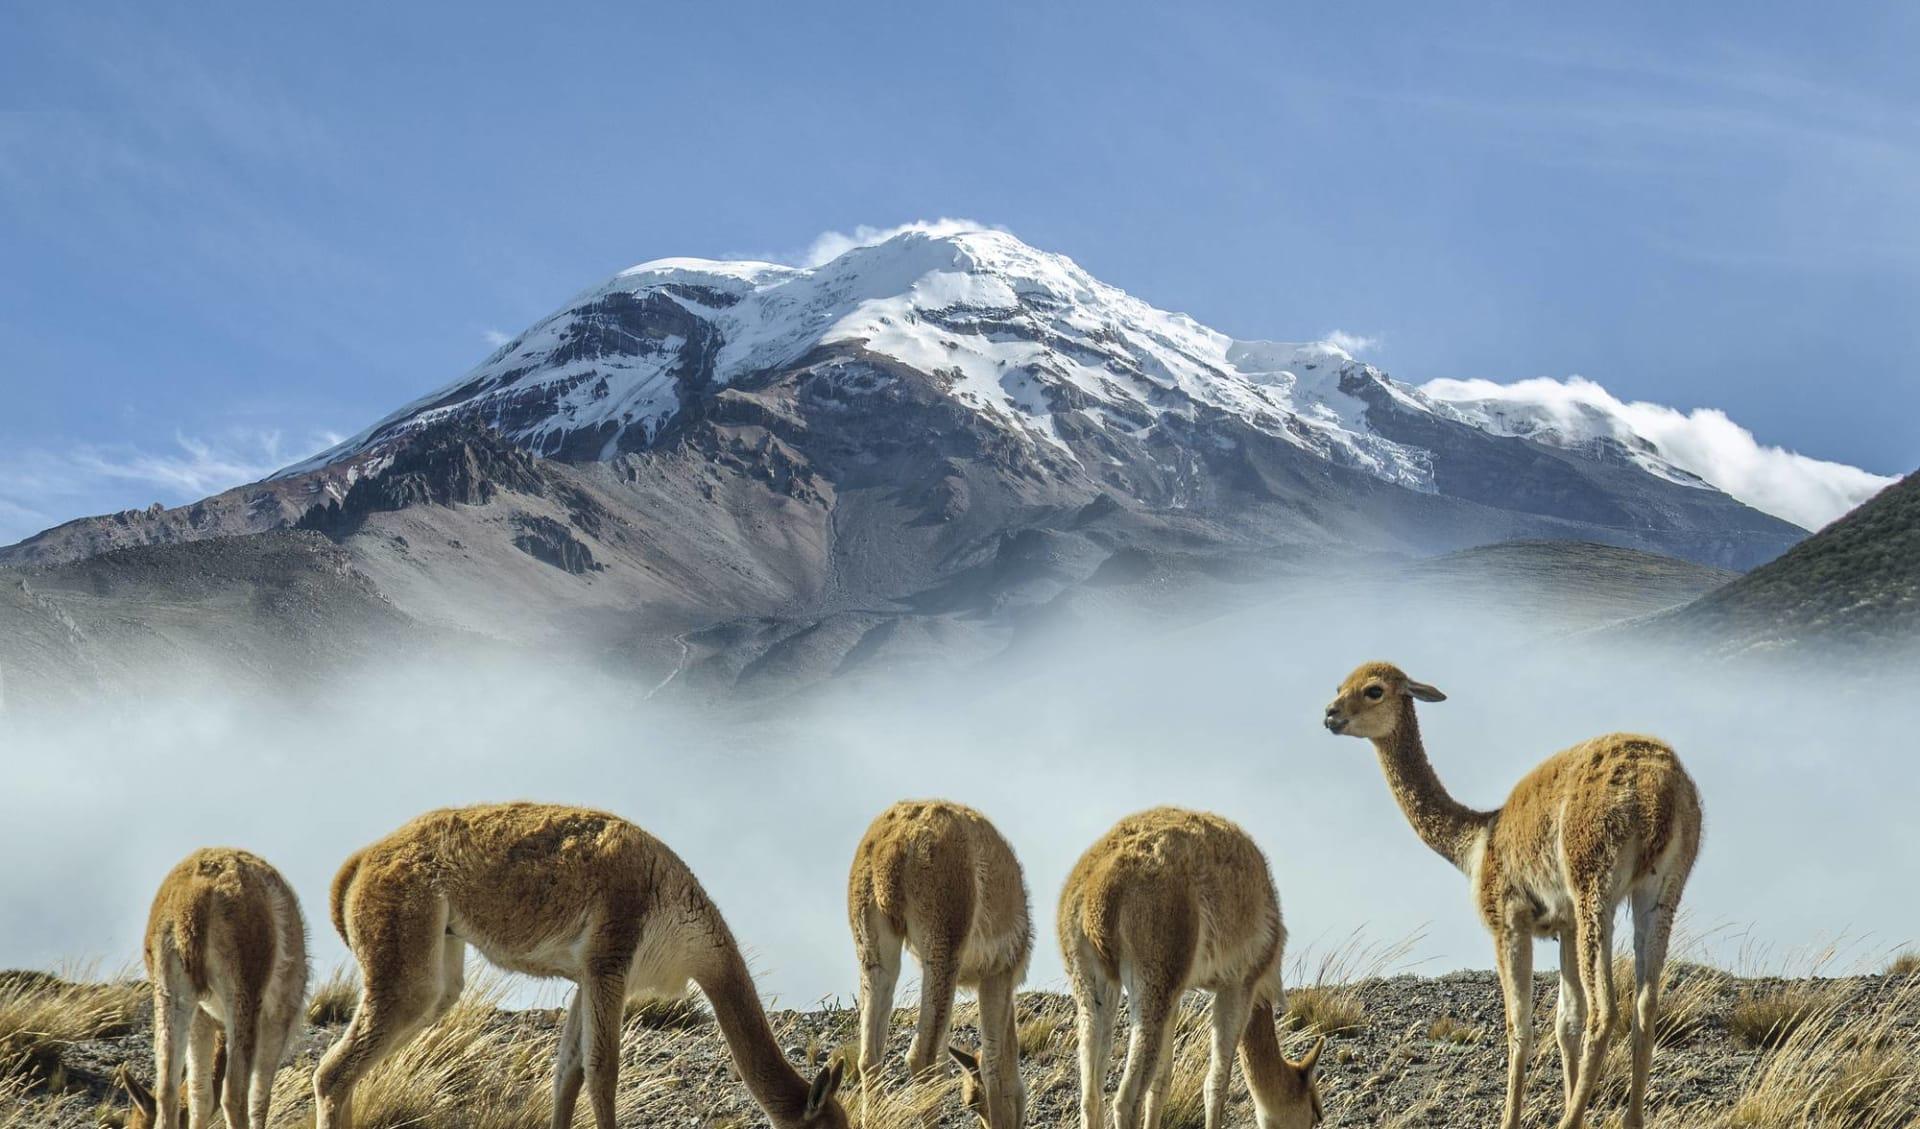 Anden - Galapagos Mosaik ab Quito: Ecuador - Chimborazo Vulkan - Lamas